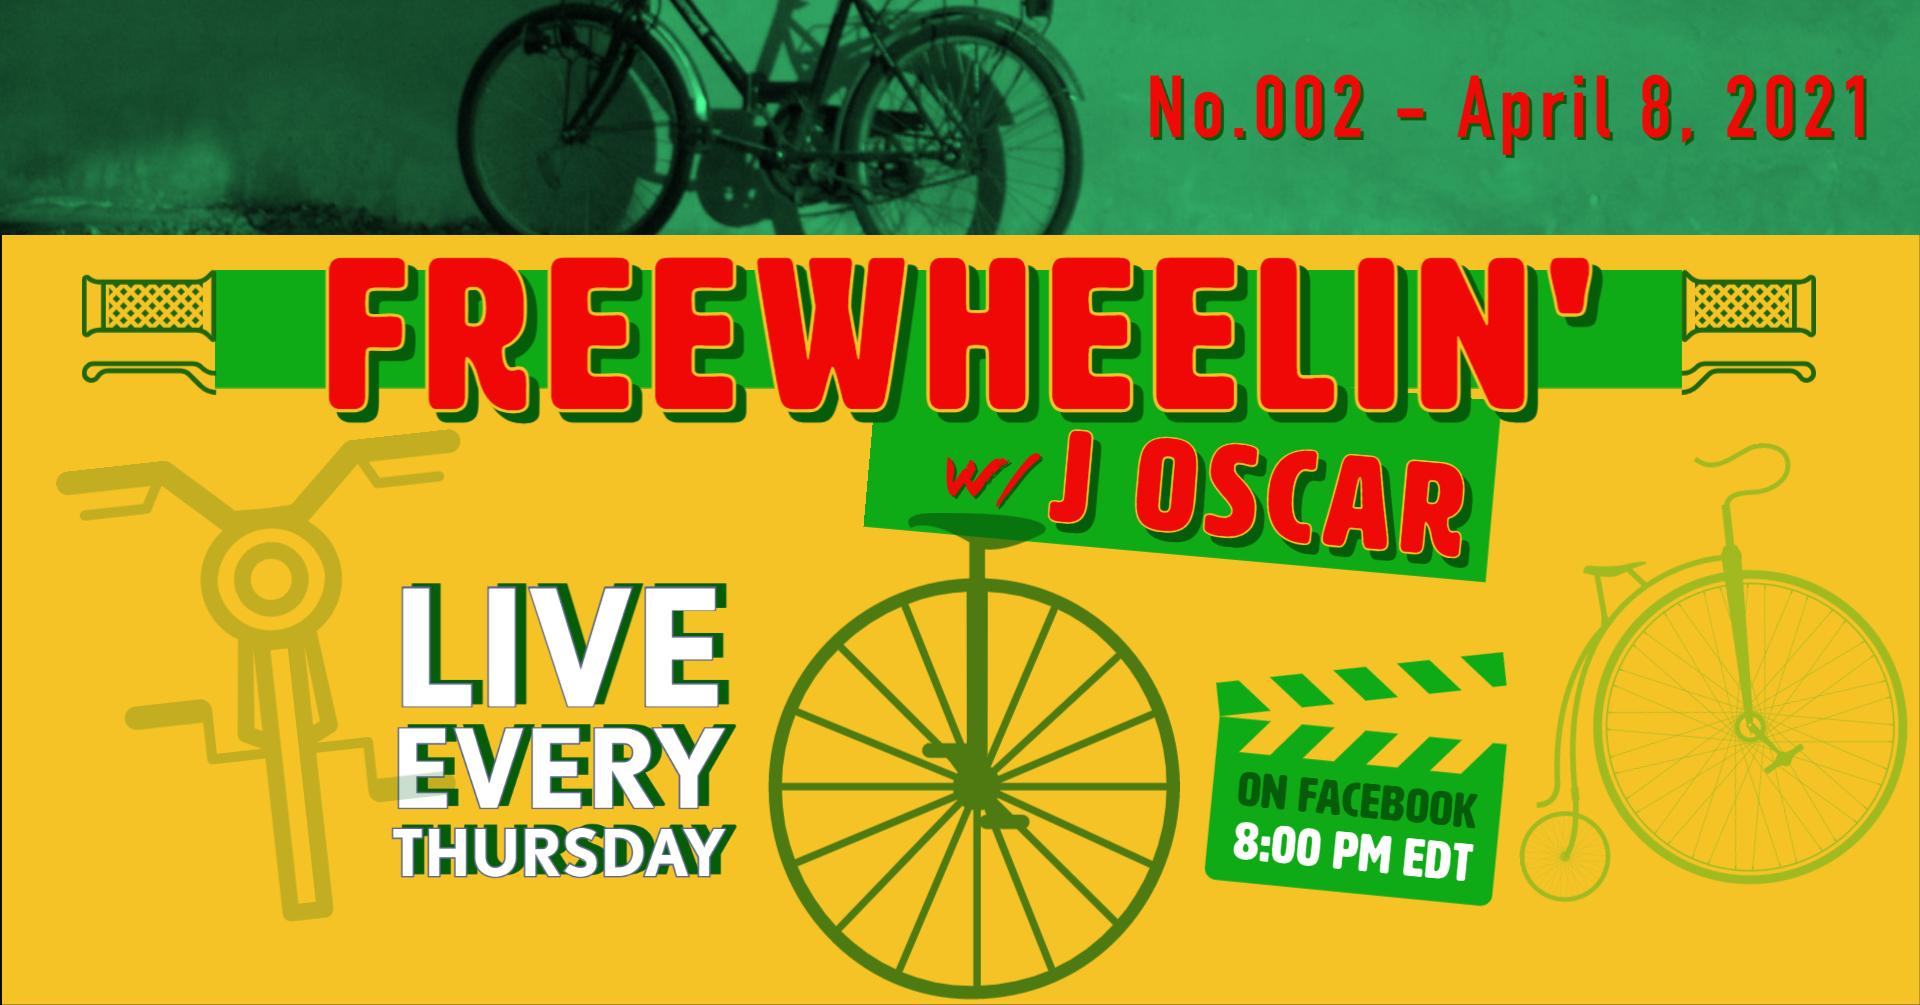 Freewheelin' with J Oscar No.002